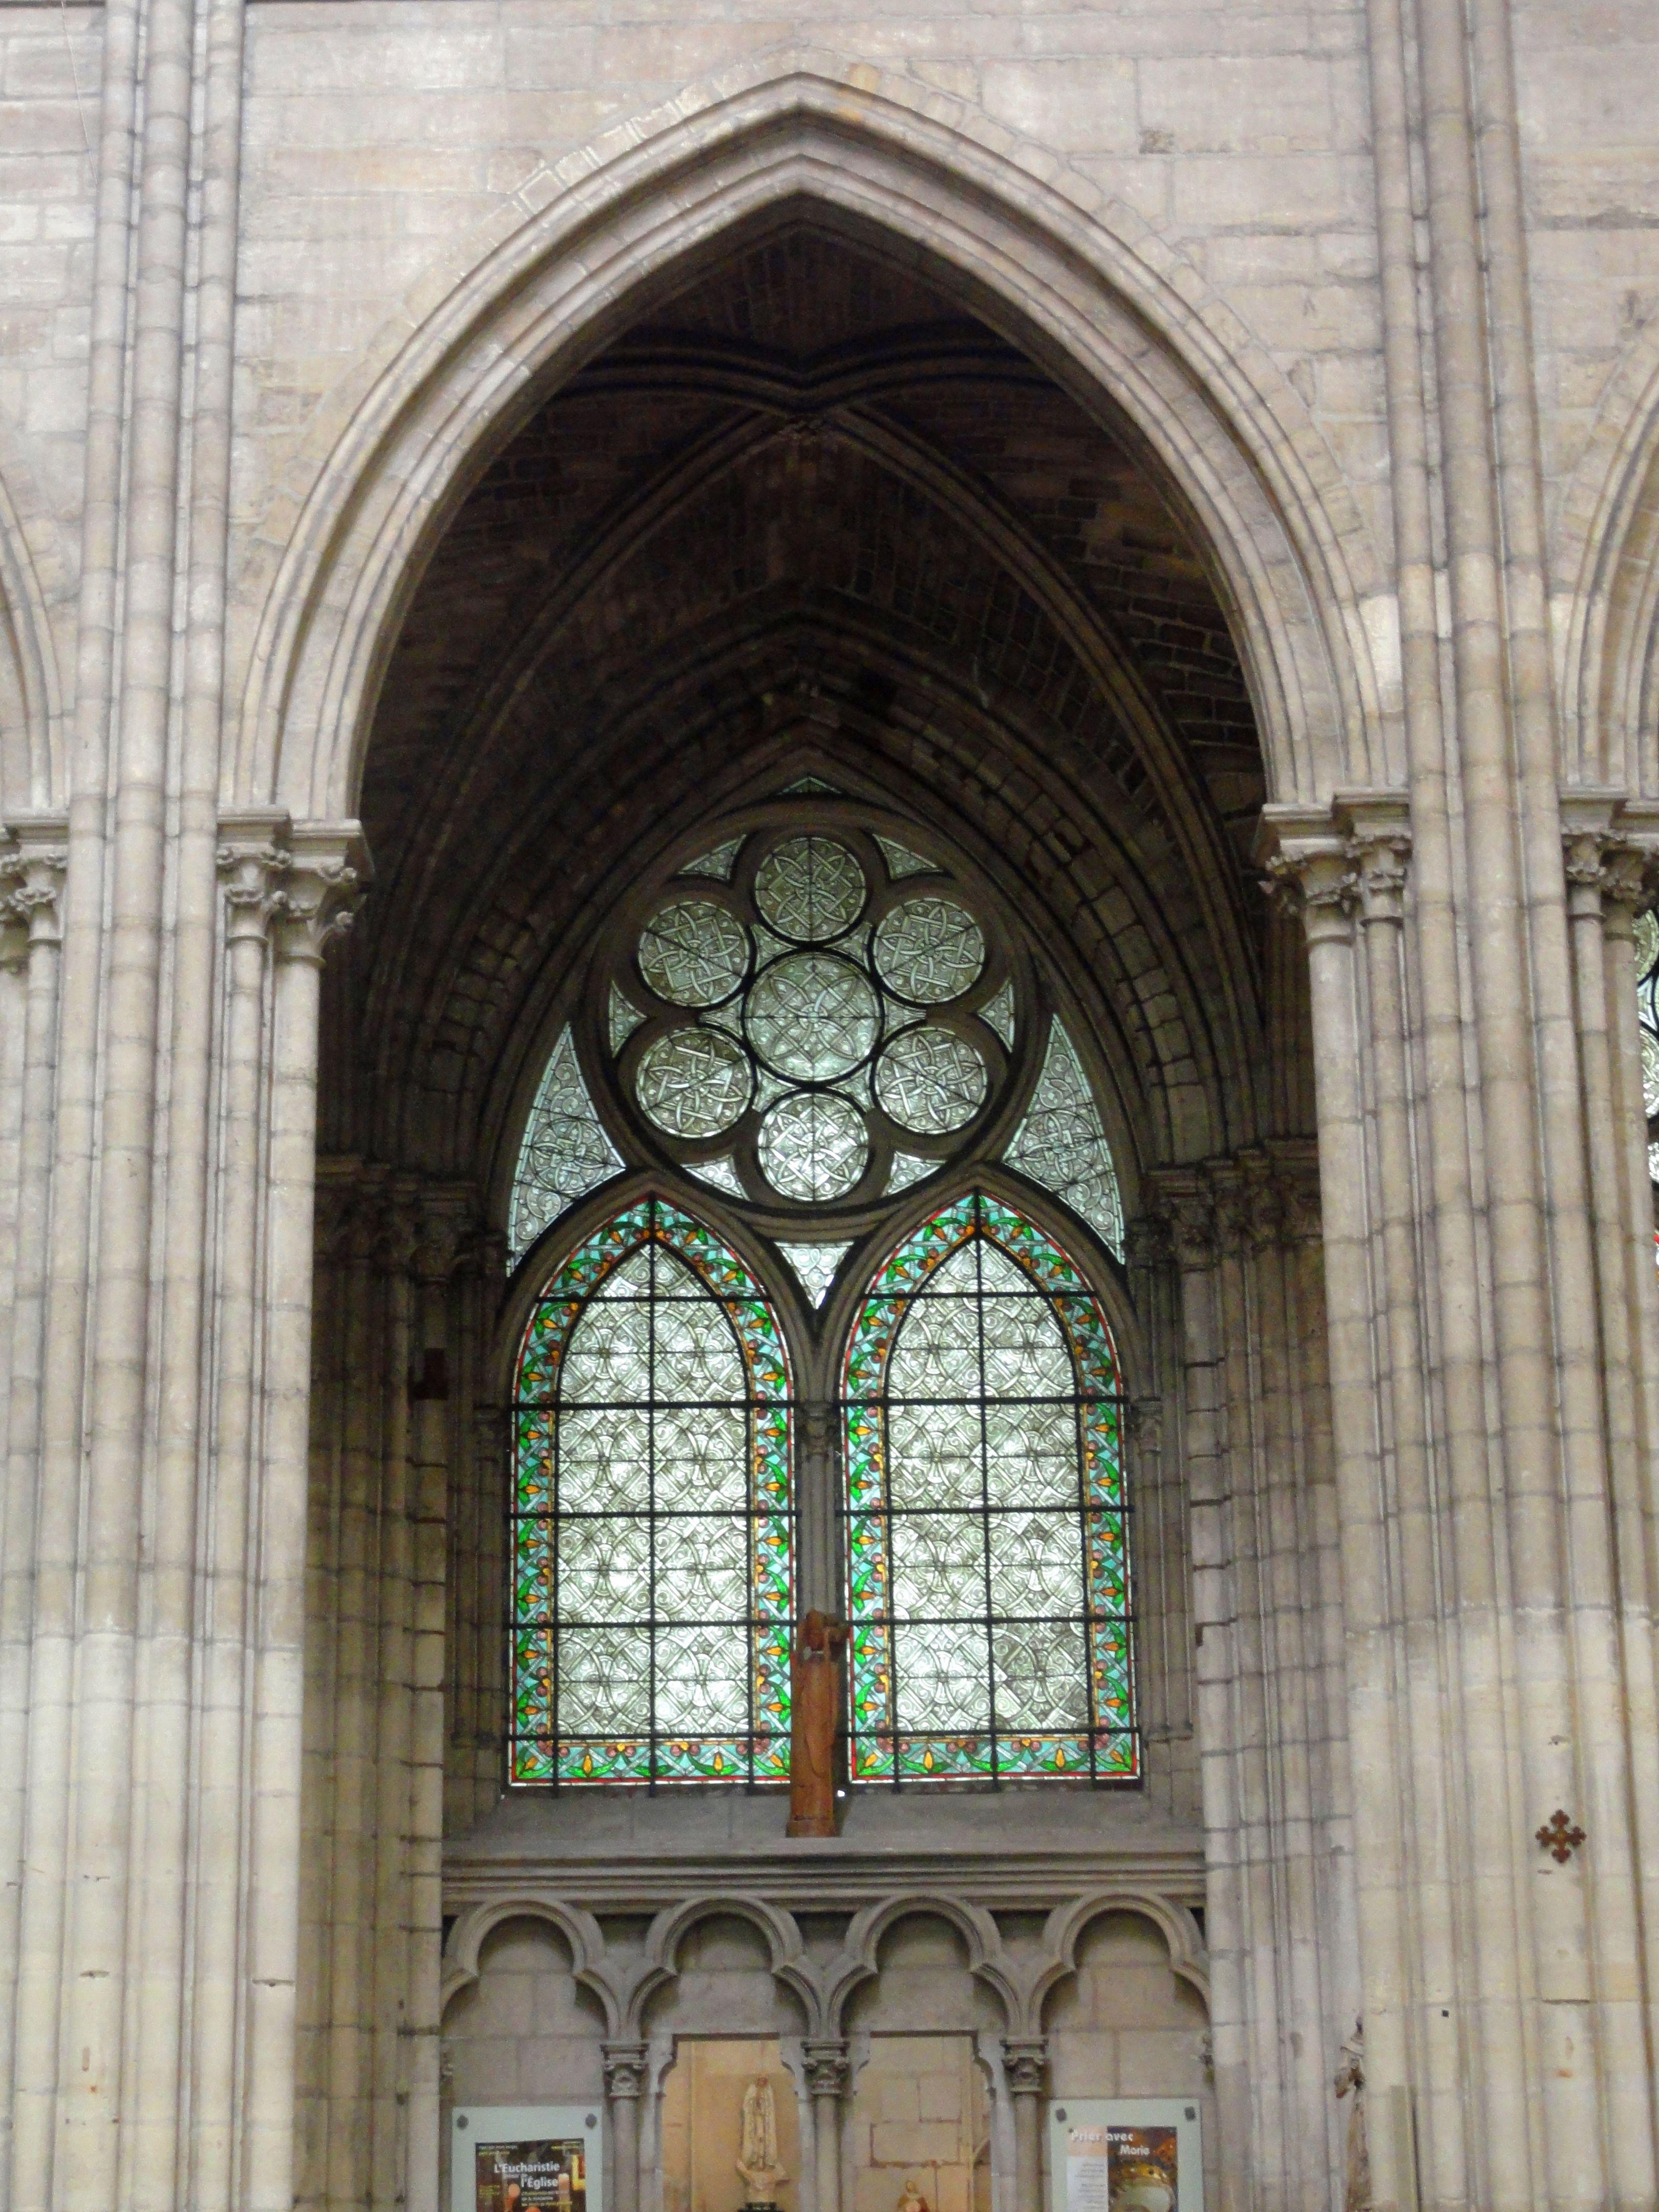 Pointed arch Pointed arch Pointed